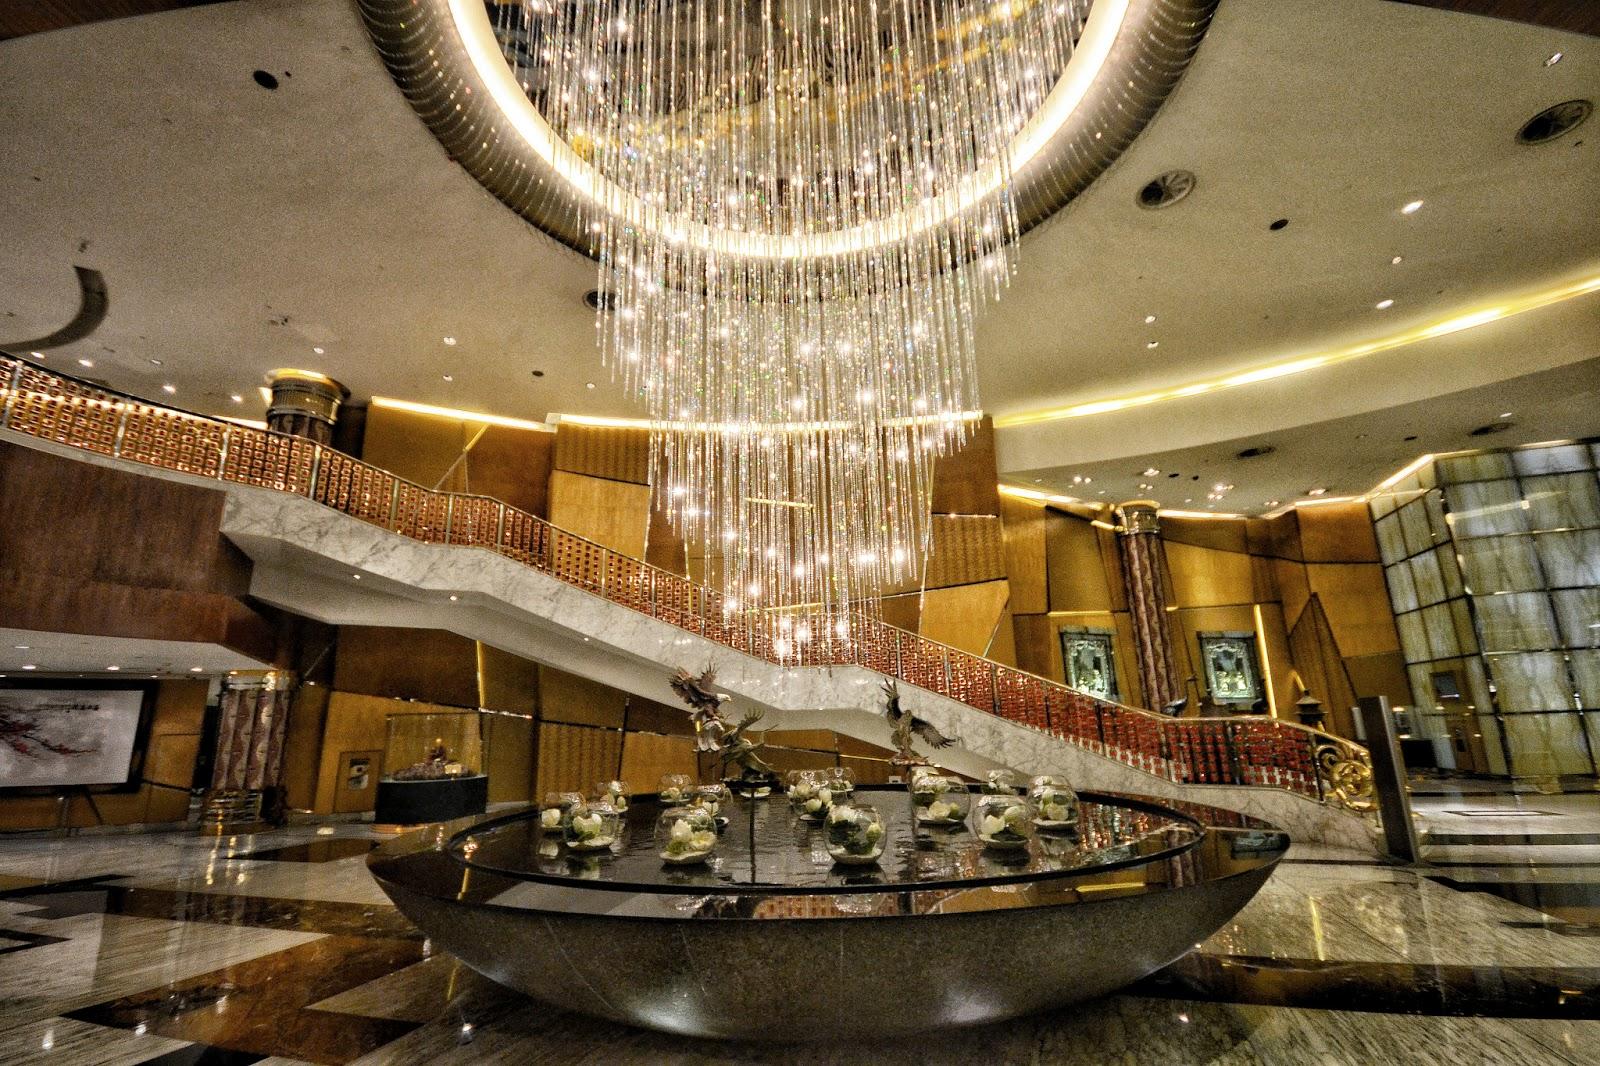 Lisboa hotel & casino gambling cheat